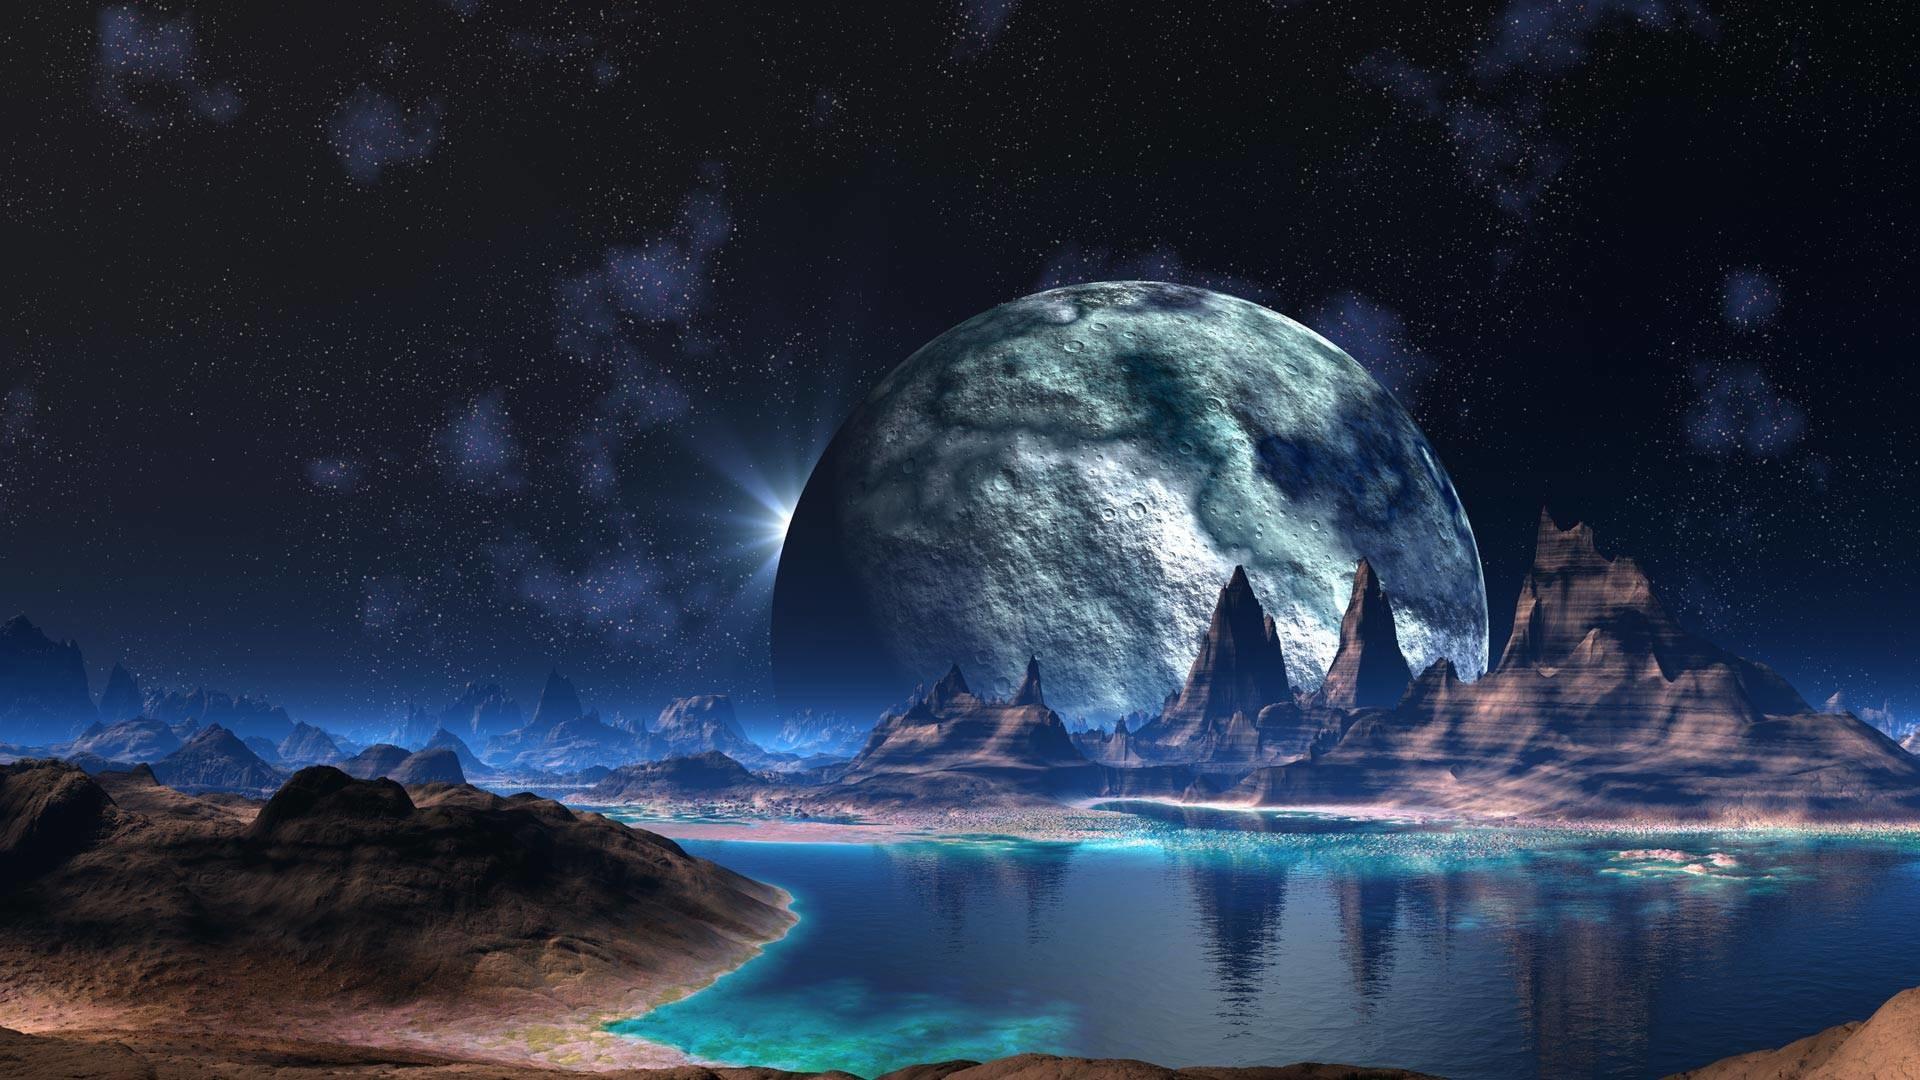 Alien Landscape Planet Stars Lake sci-fi space reflection mountains .